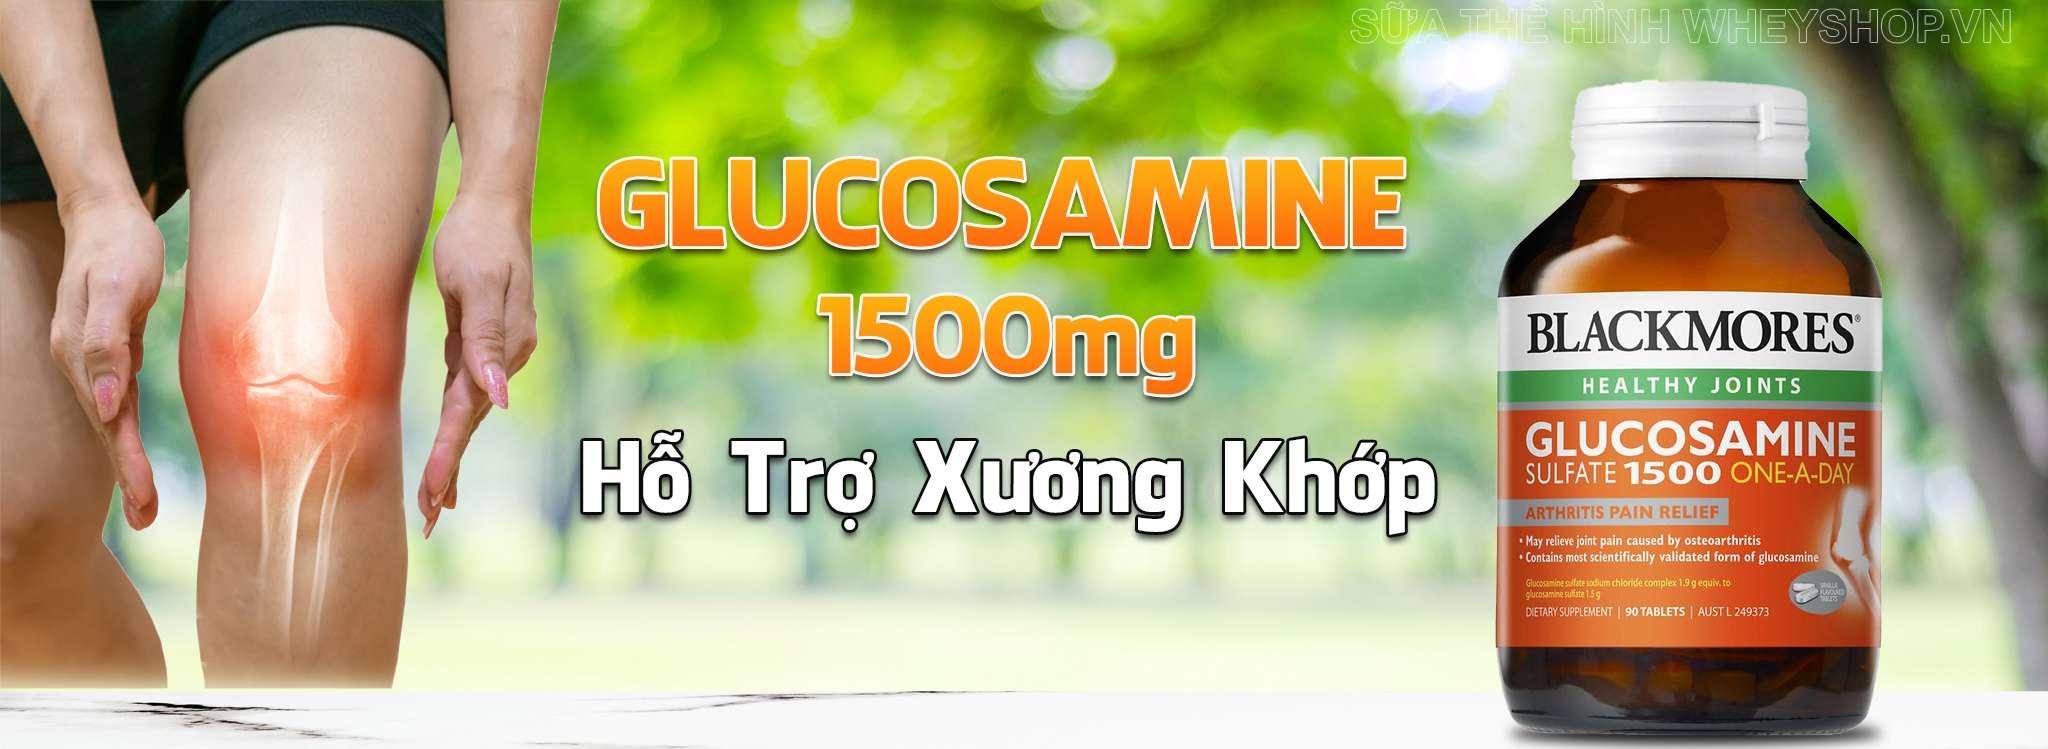 Blackmores Glucosamine 1500mg gia re ha noi tphcm